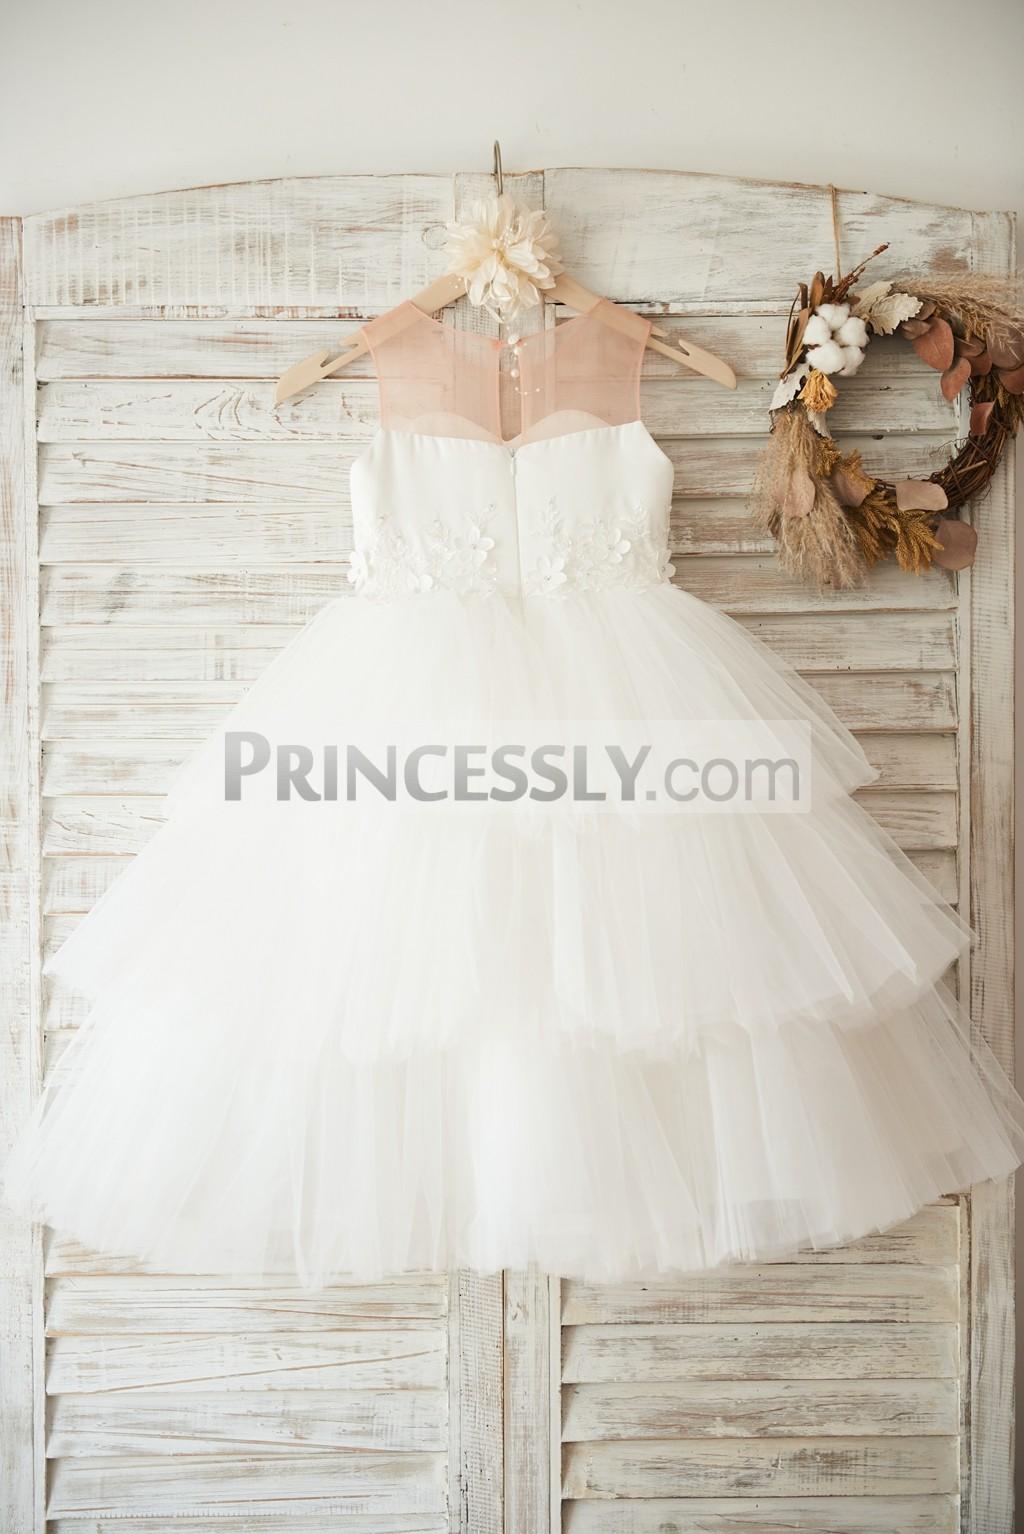 Cupcake wedding baby girl dress with slit on back